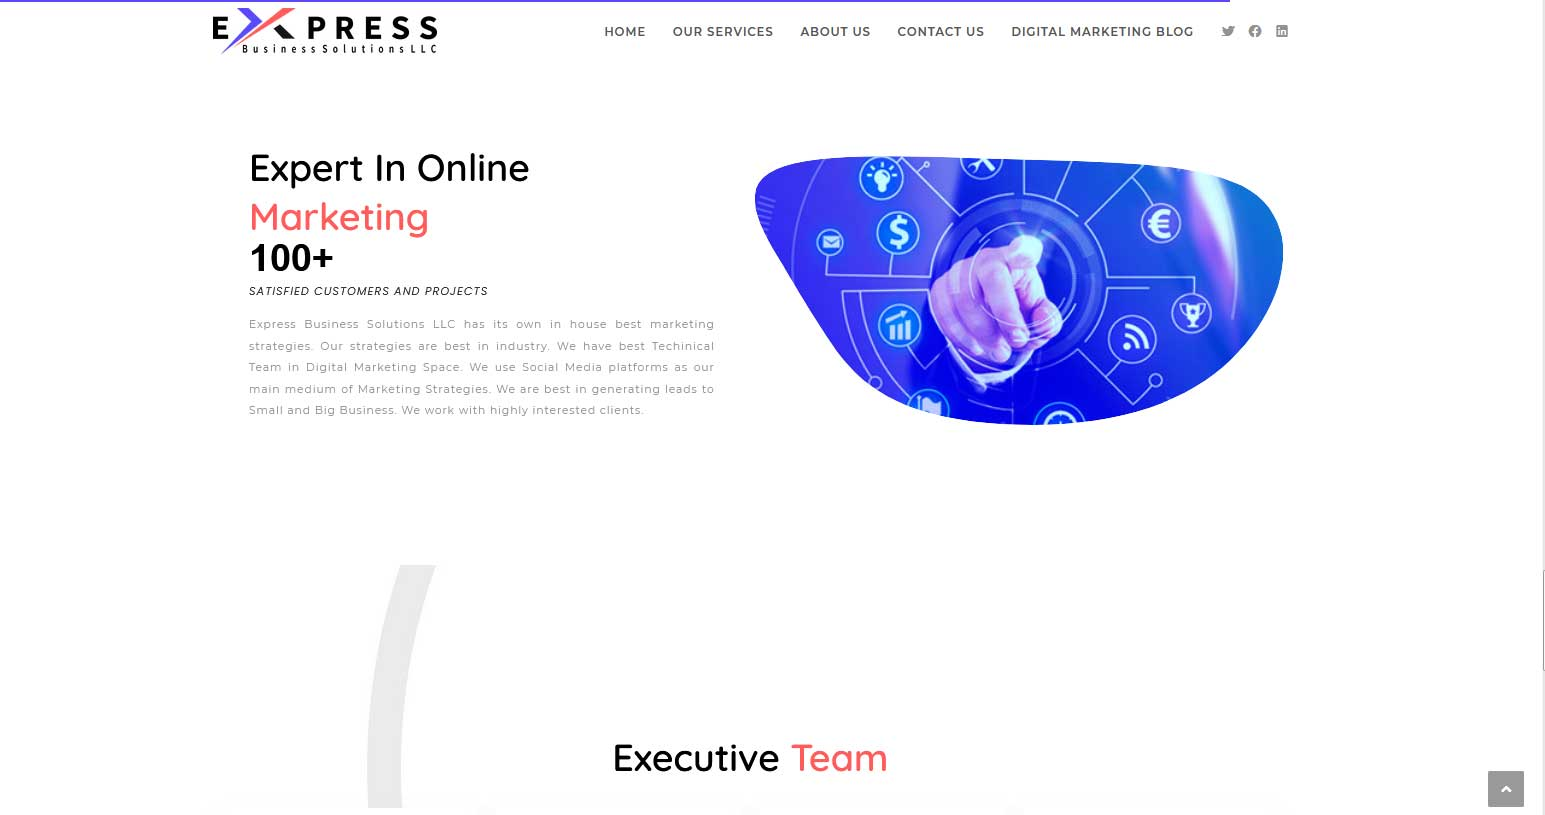 express-biz-sol-expert-in-online-marketing-100